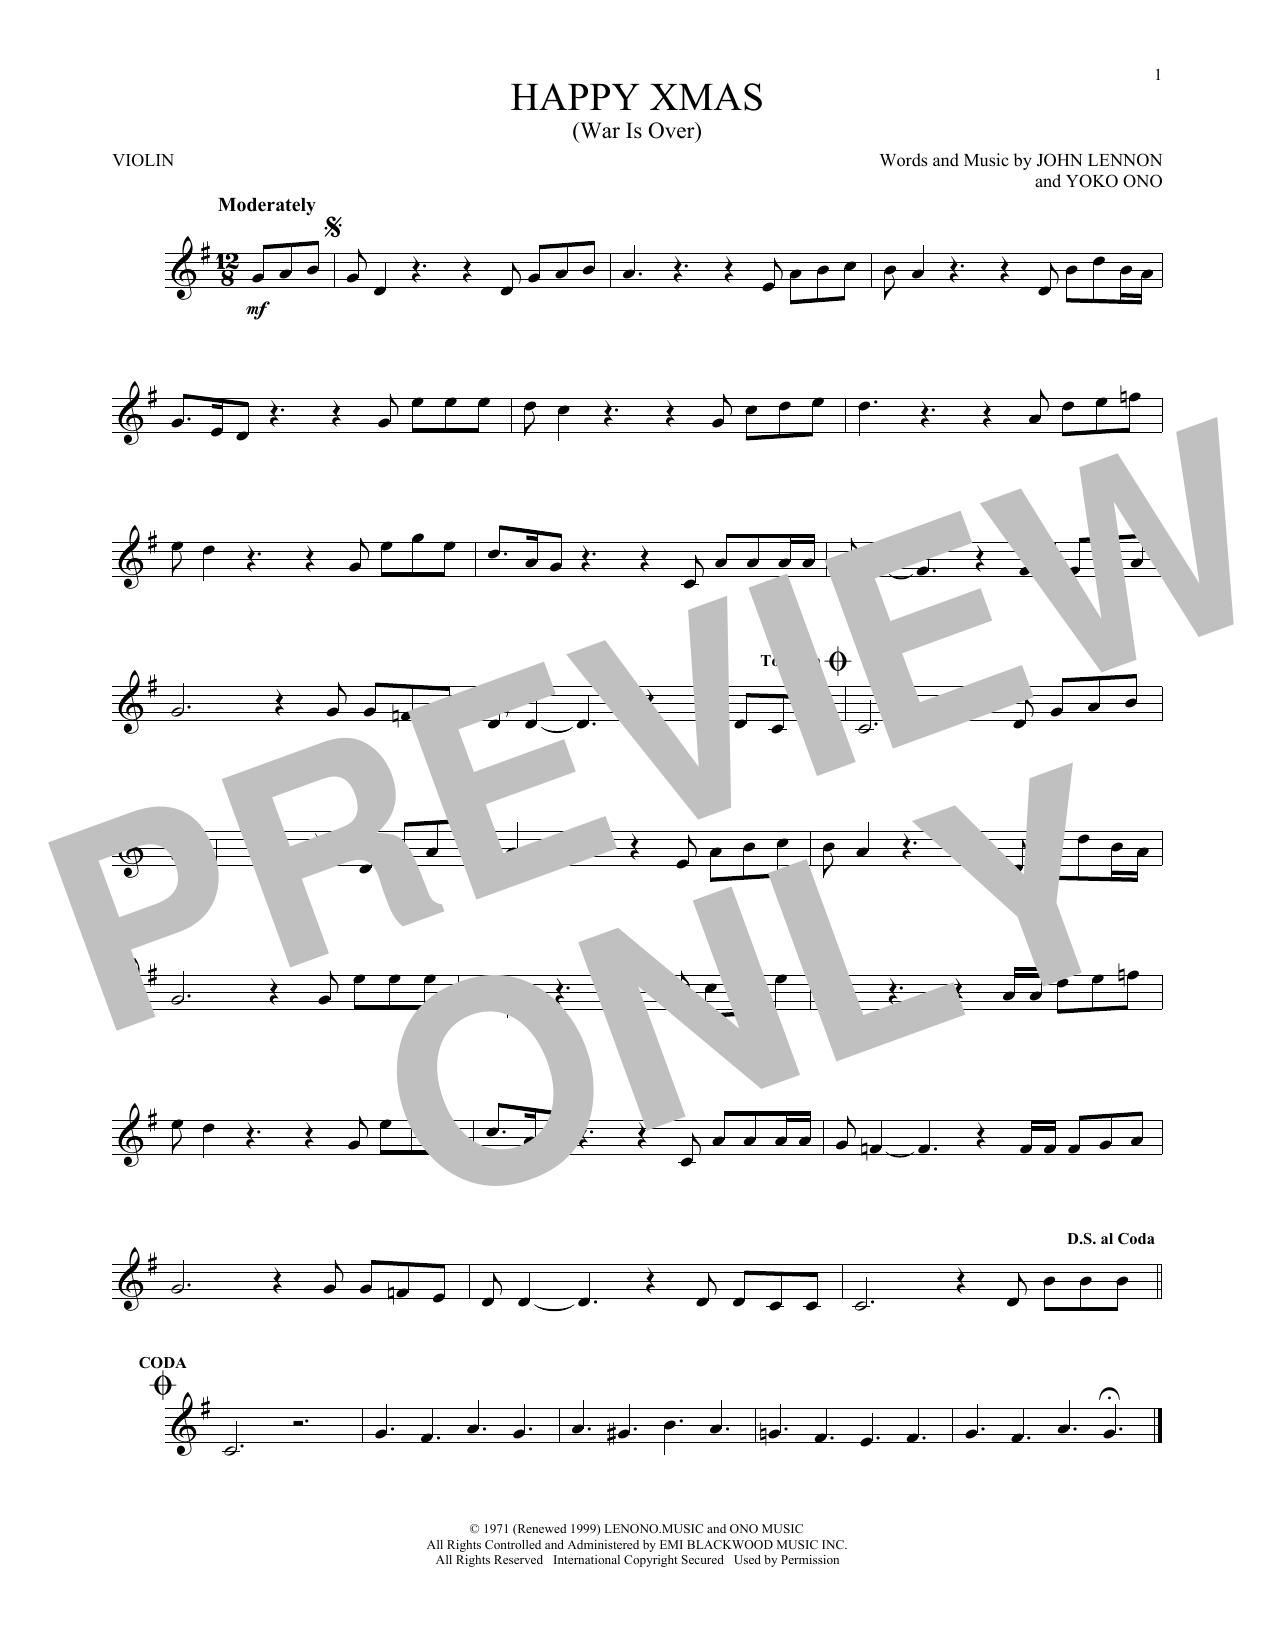 Sheet music digital files to print licensed yoko ono digital sheet music digital files to print licensed yoko ono digital sheet music hexwebz Images